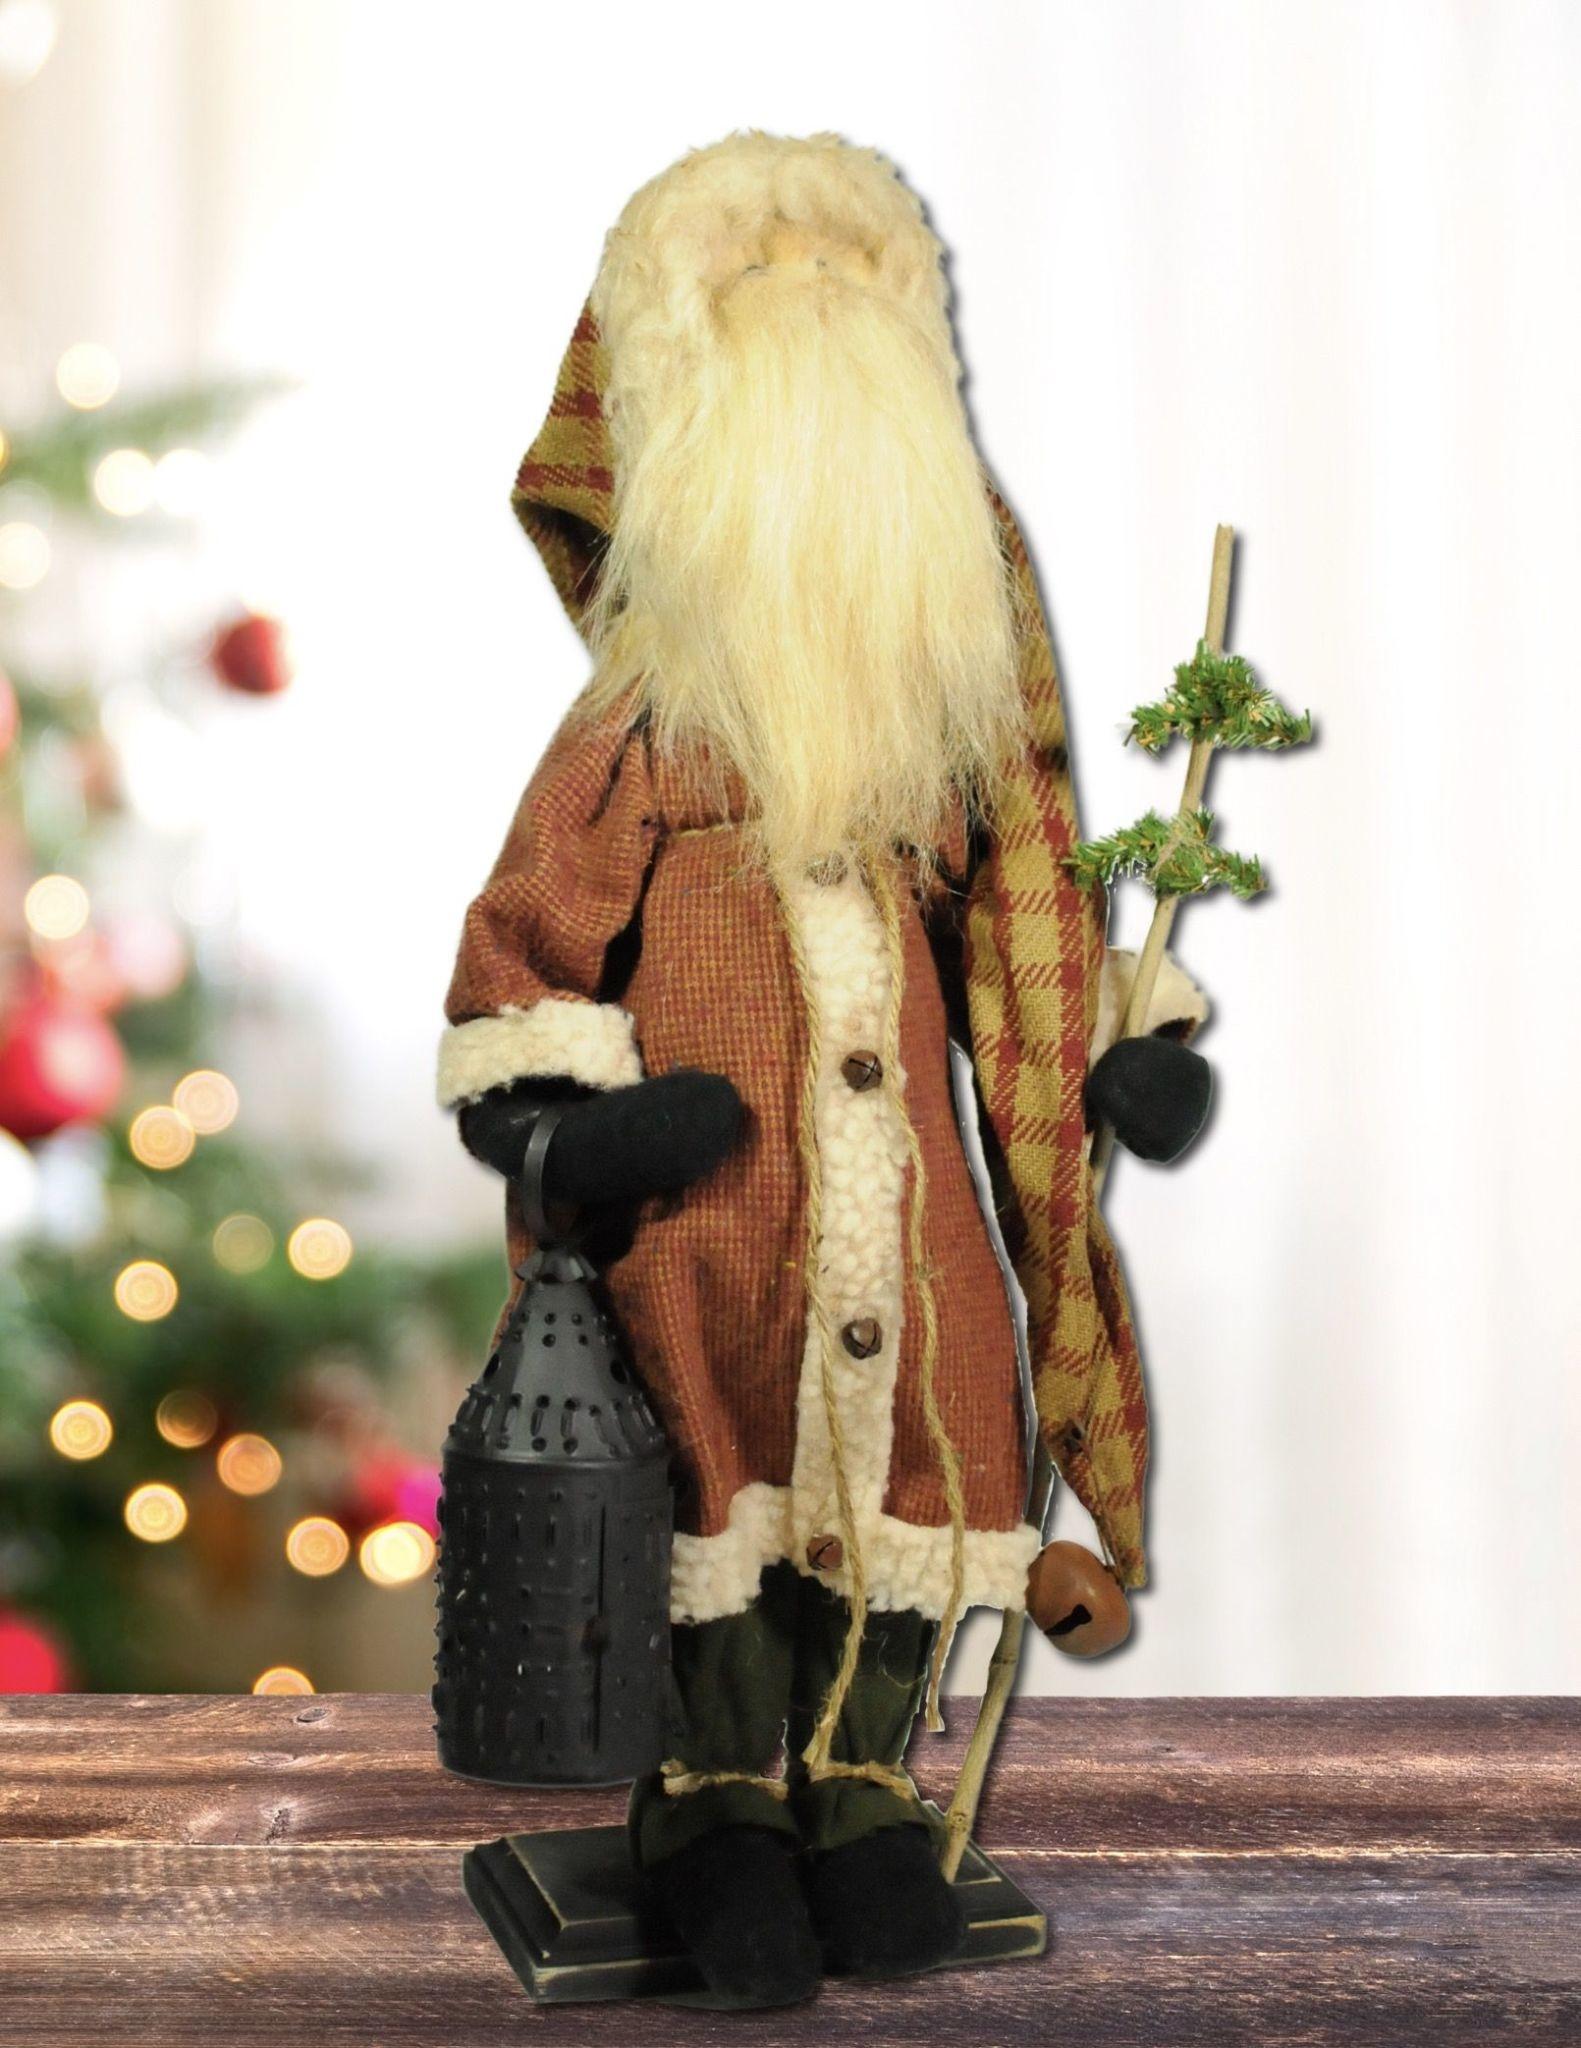 Nana's Farmhouse Santa Red Check Suit Holding Lantern